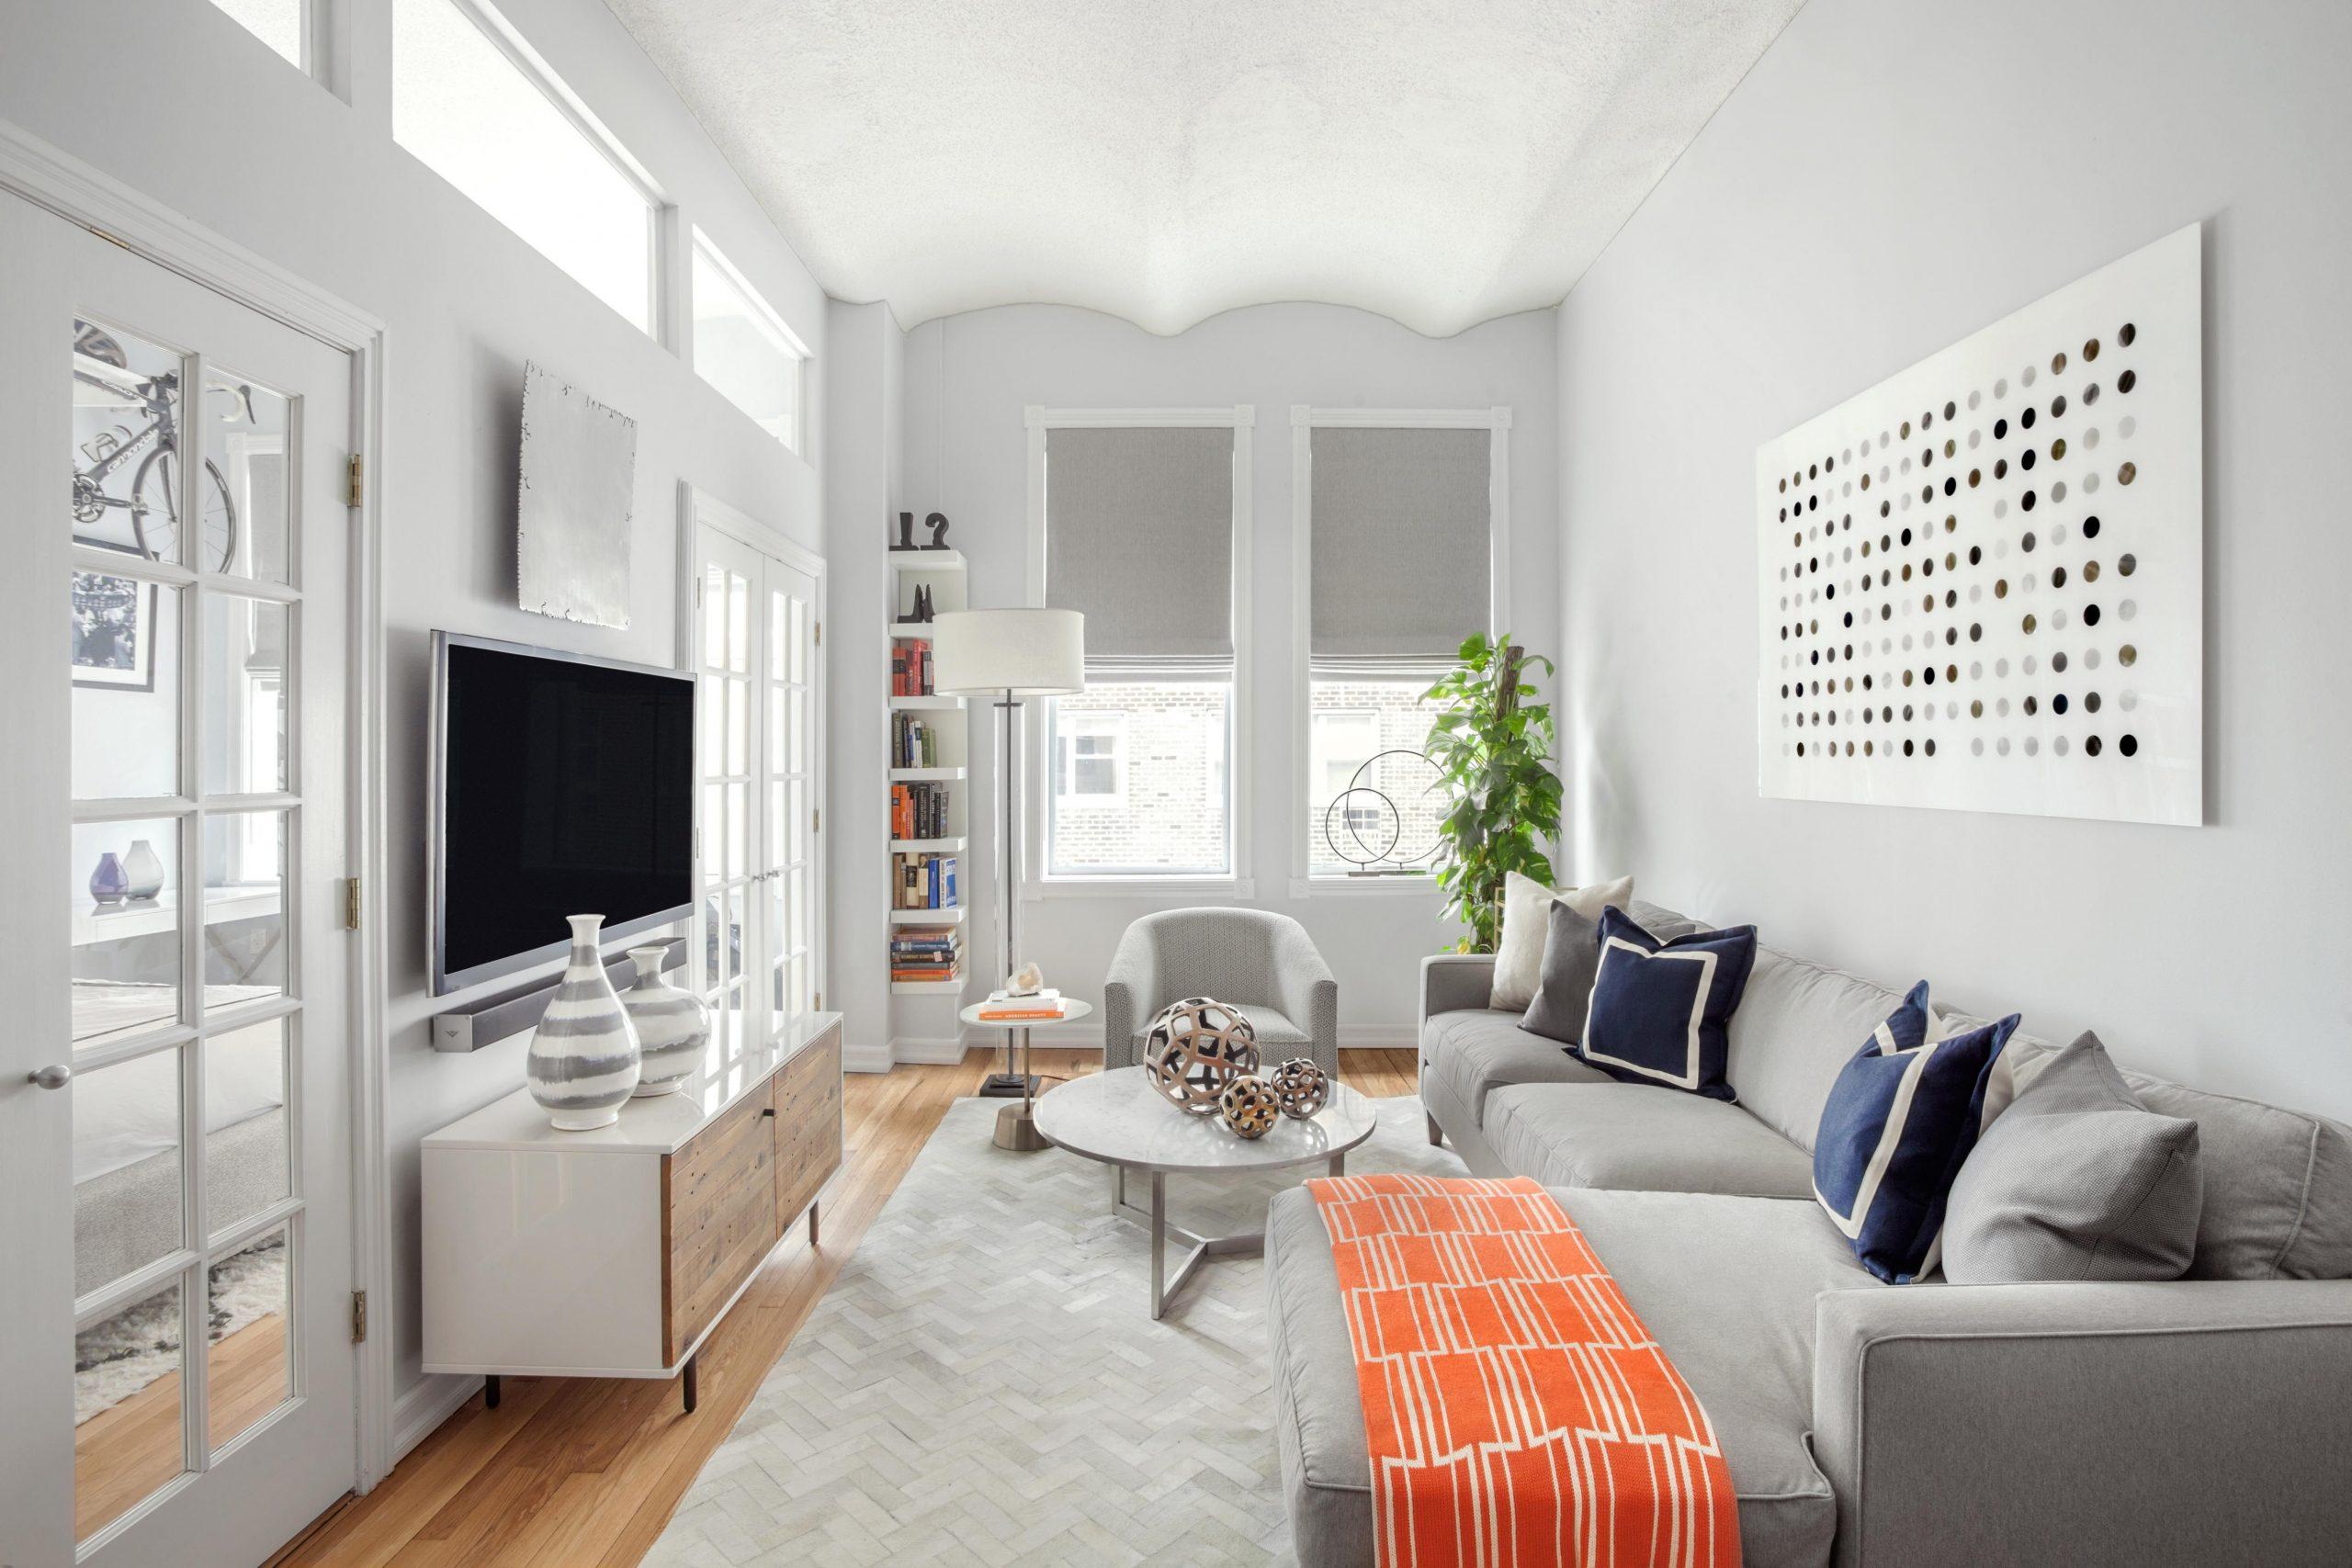 Living Room Modern Apartment Decor I Need Help Decorating Ideas  - Apartment Design Help